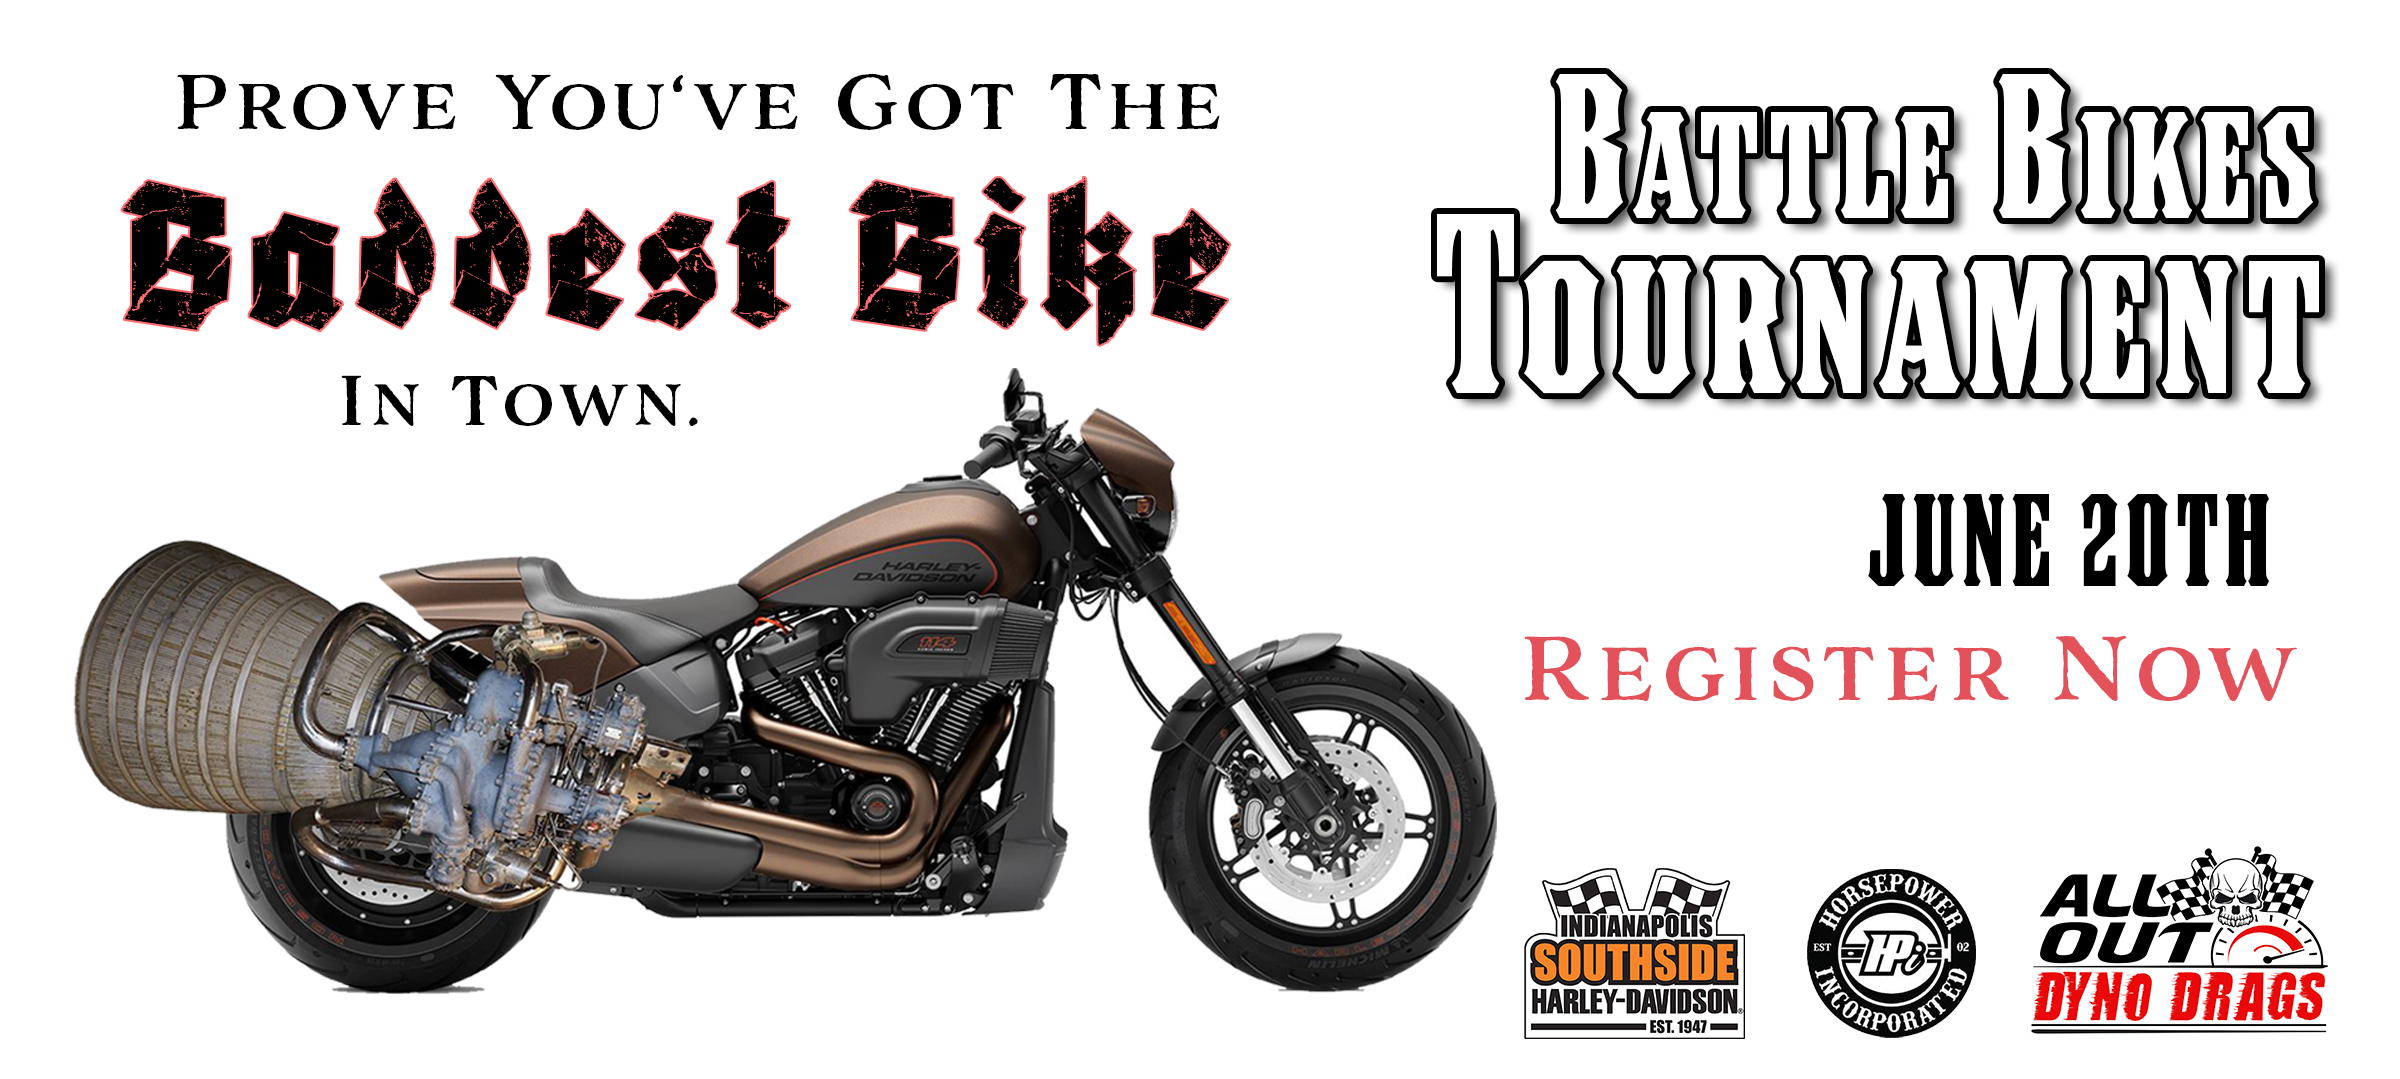 battle bikes